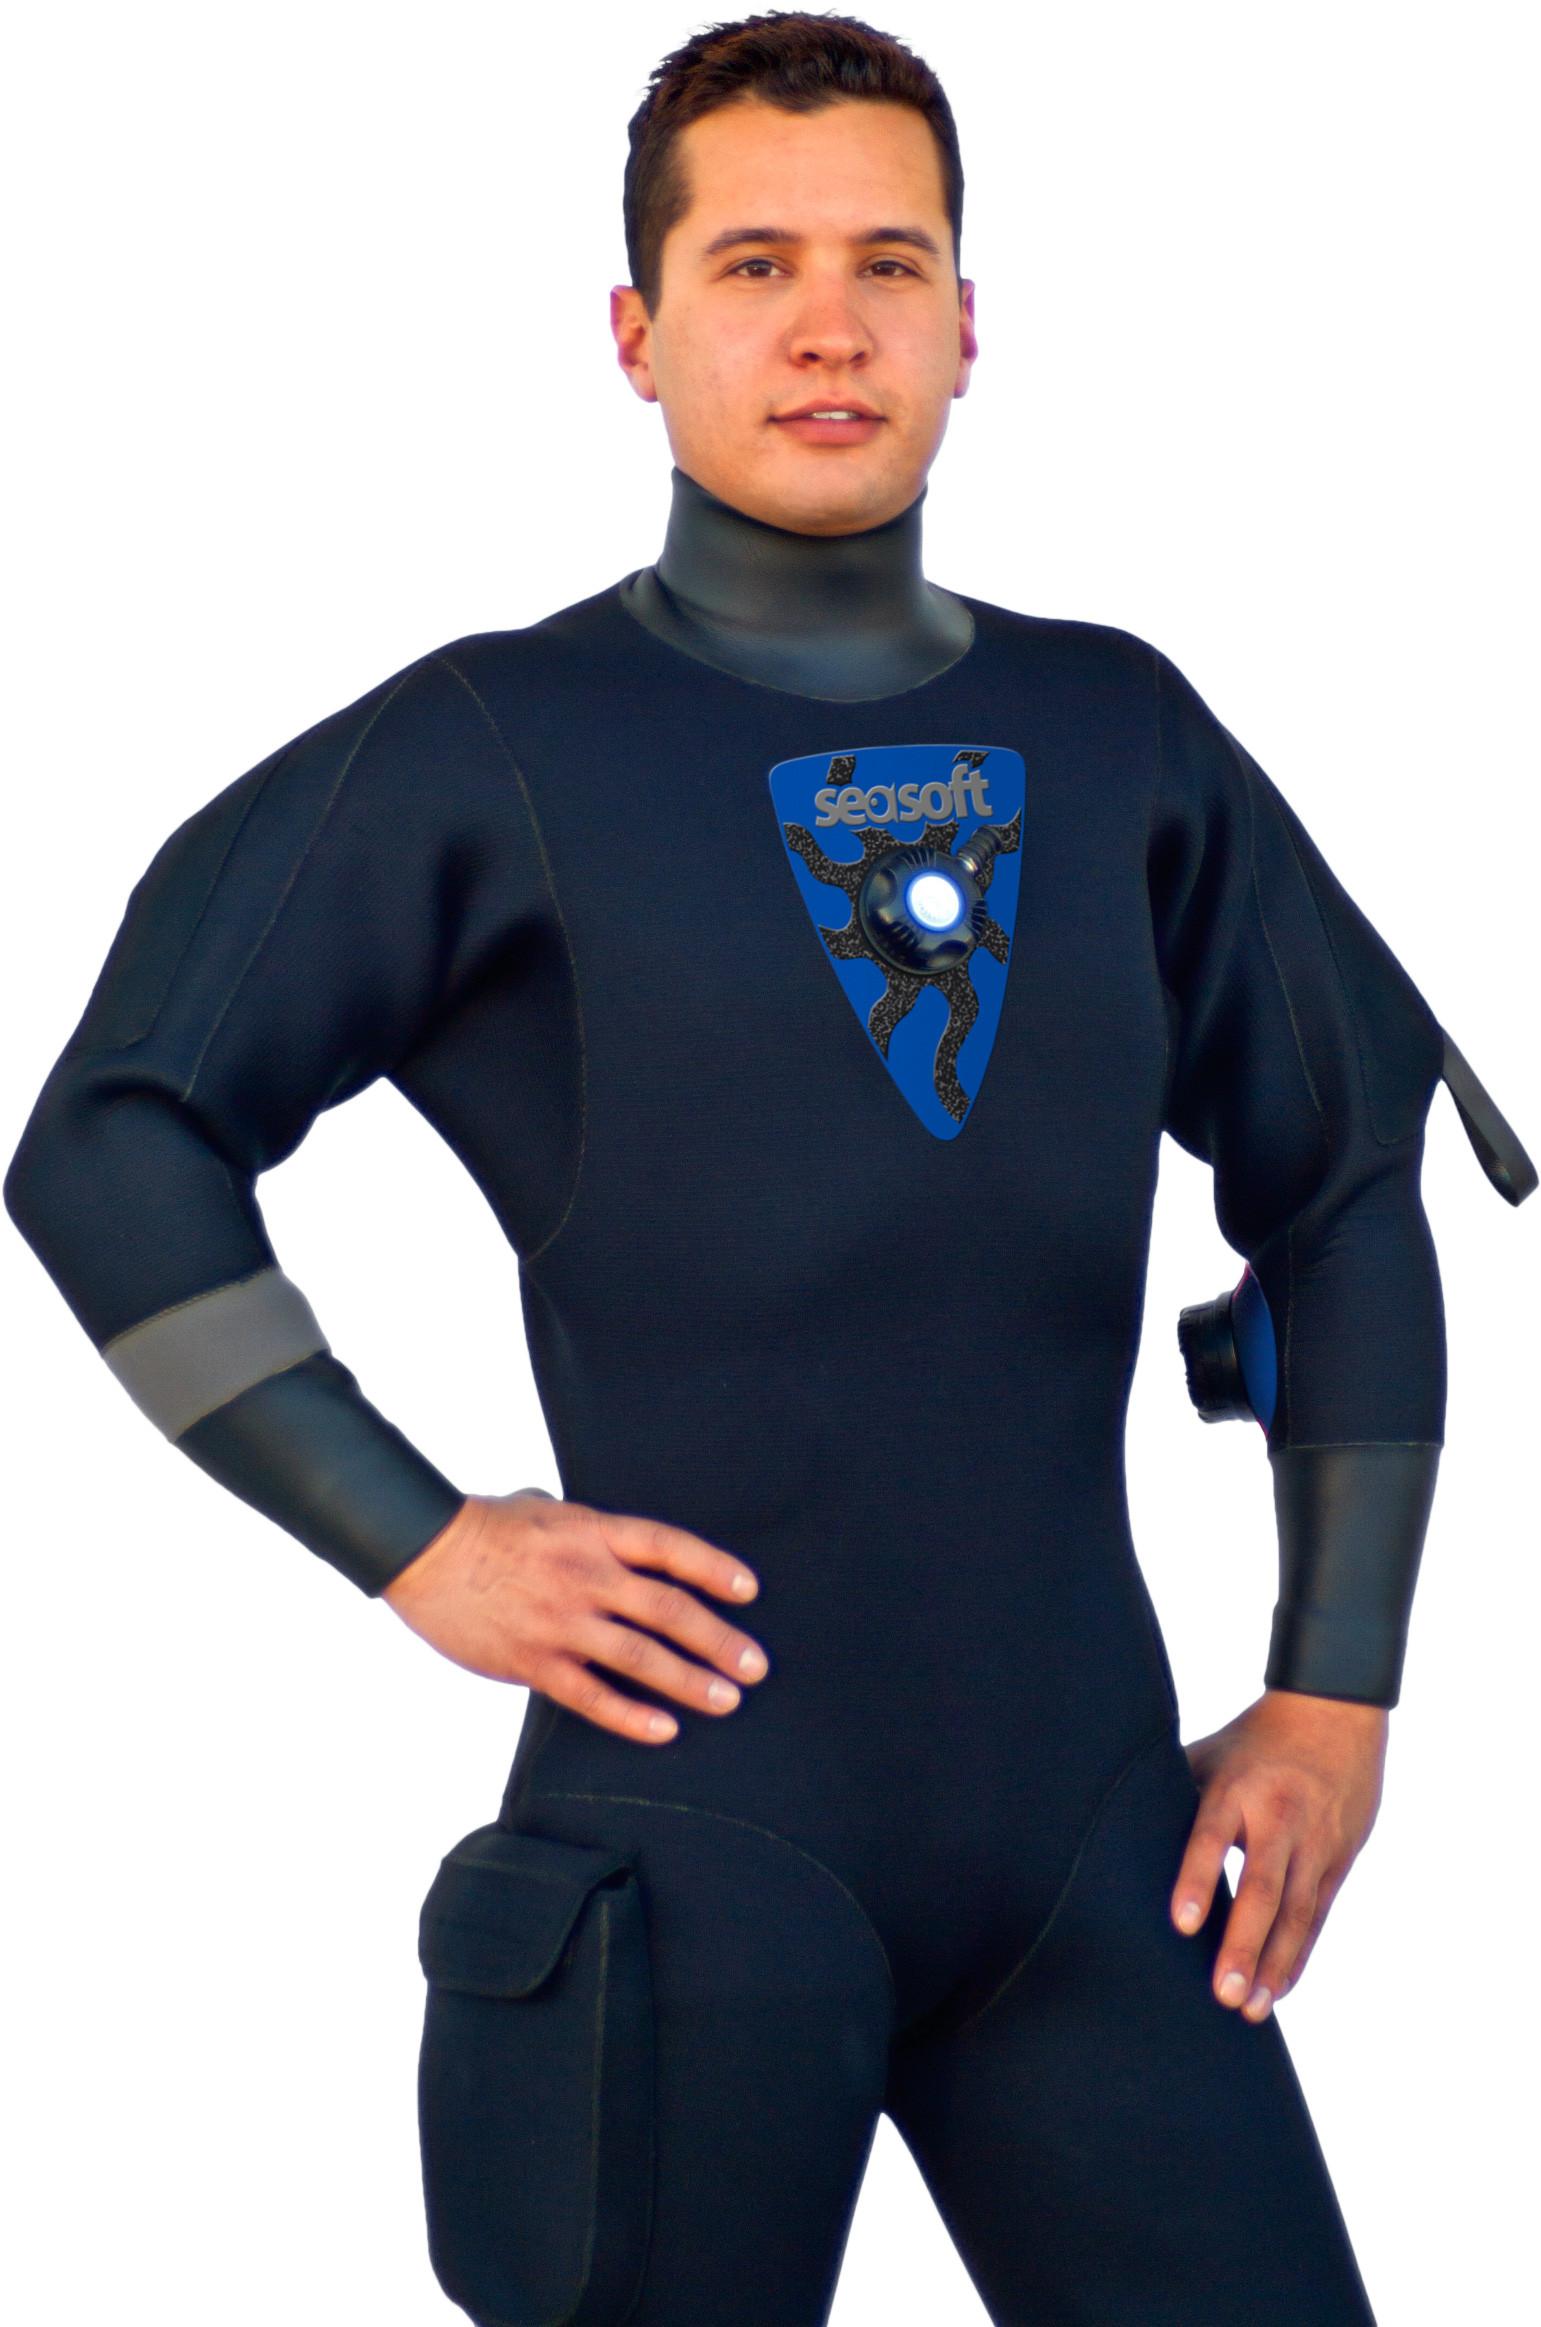 SEASOFT Ti 3000™ Drysuits